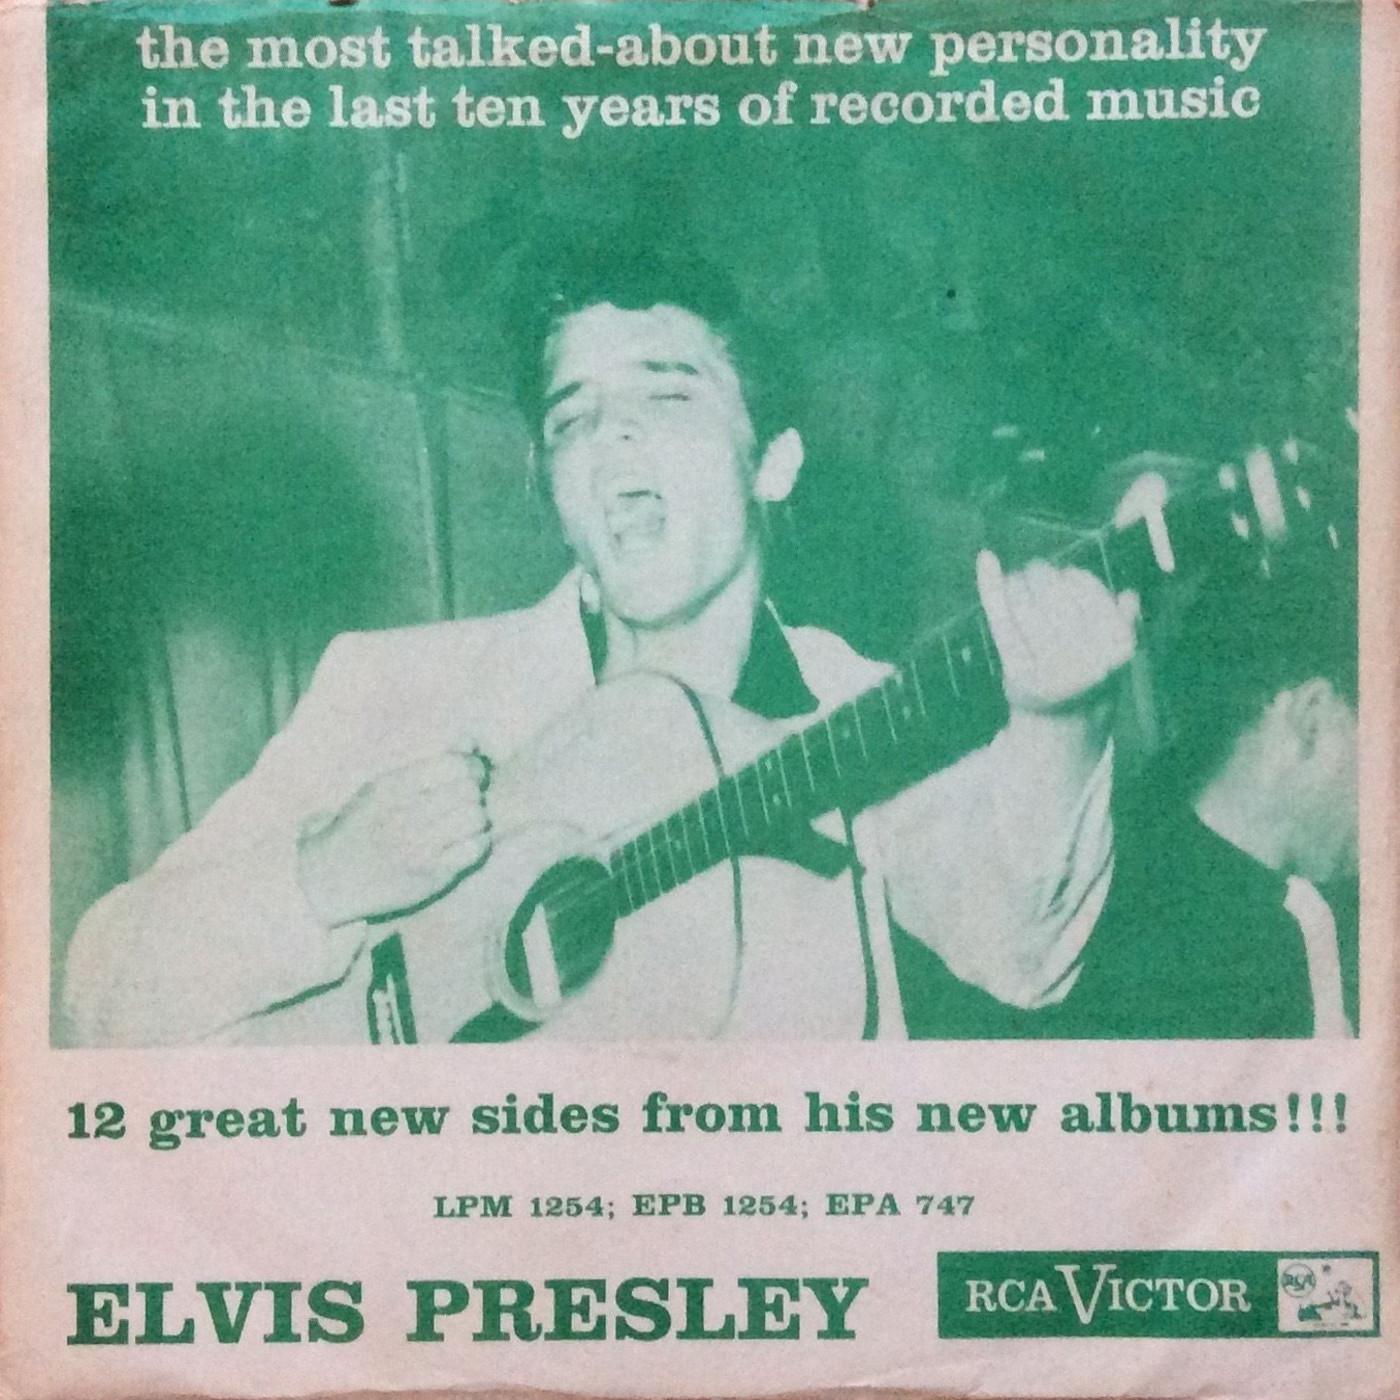 ELVIS PRESLEY Epb1254a0lxnx